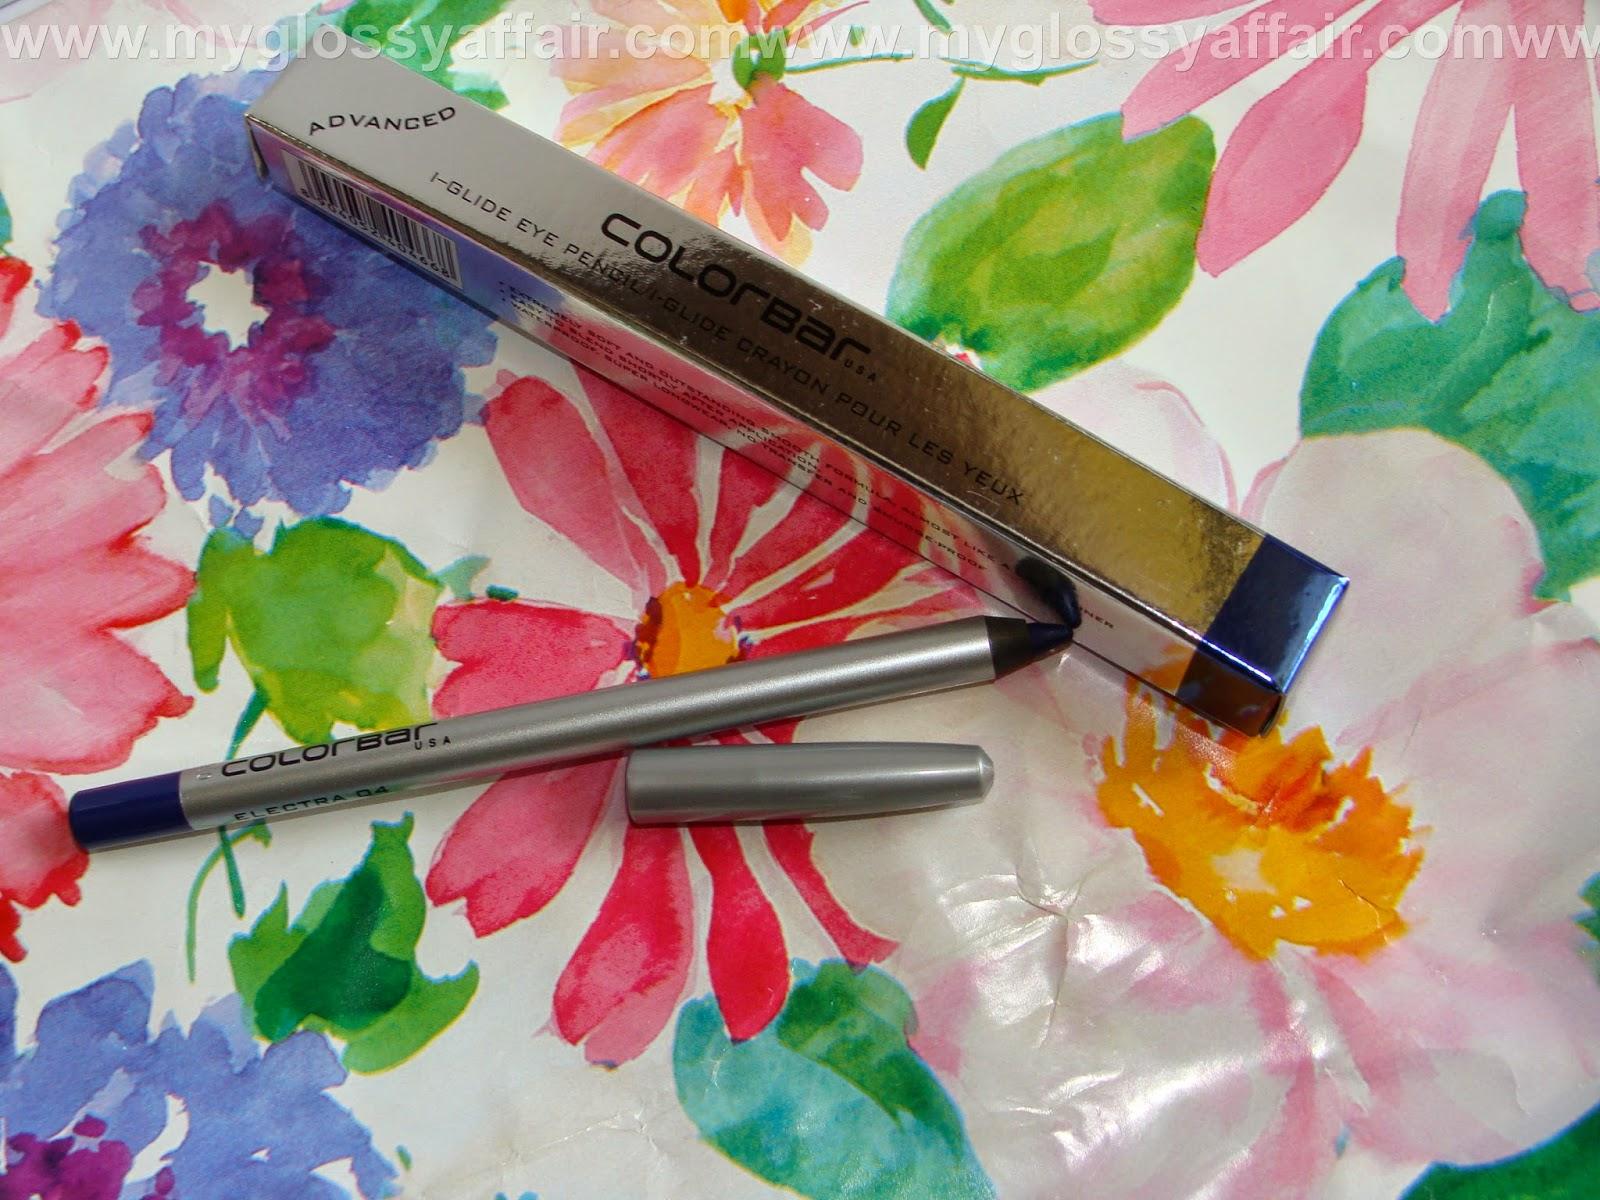 Colorbar I-Glide Eye Pencil in Electra